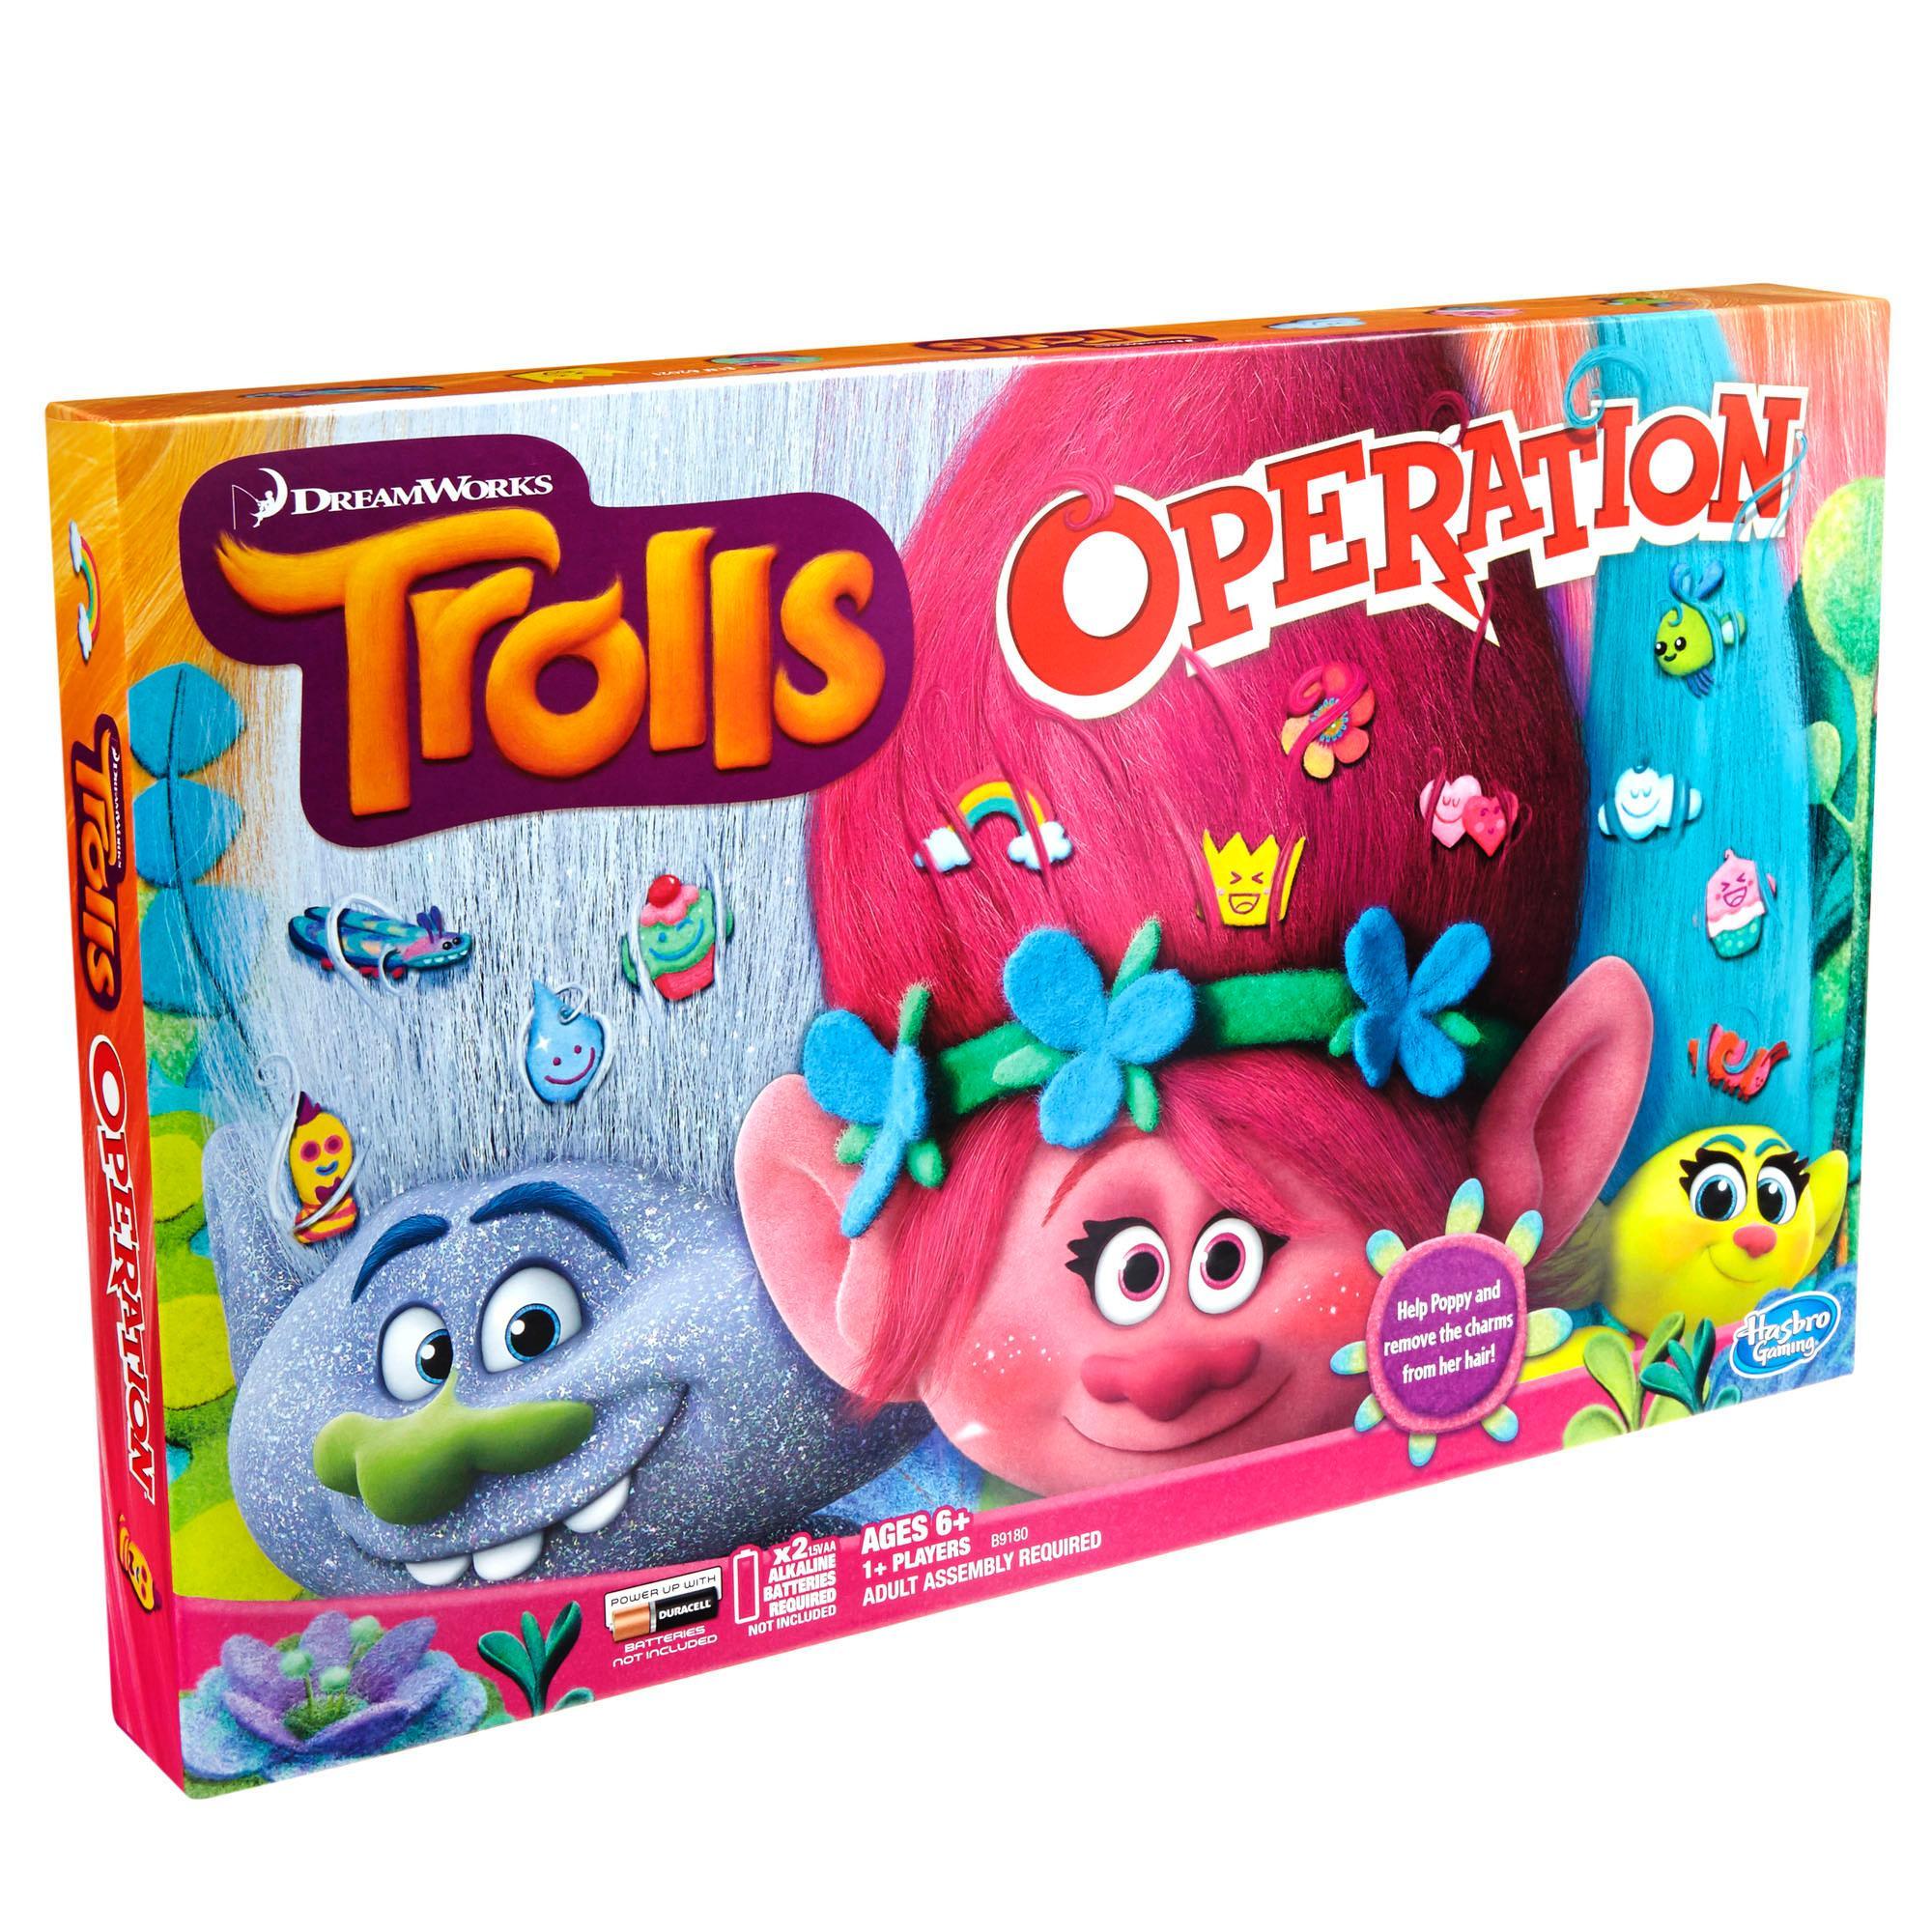 Juego Operando: Edición DreamWorks Trolls